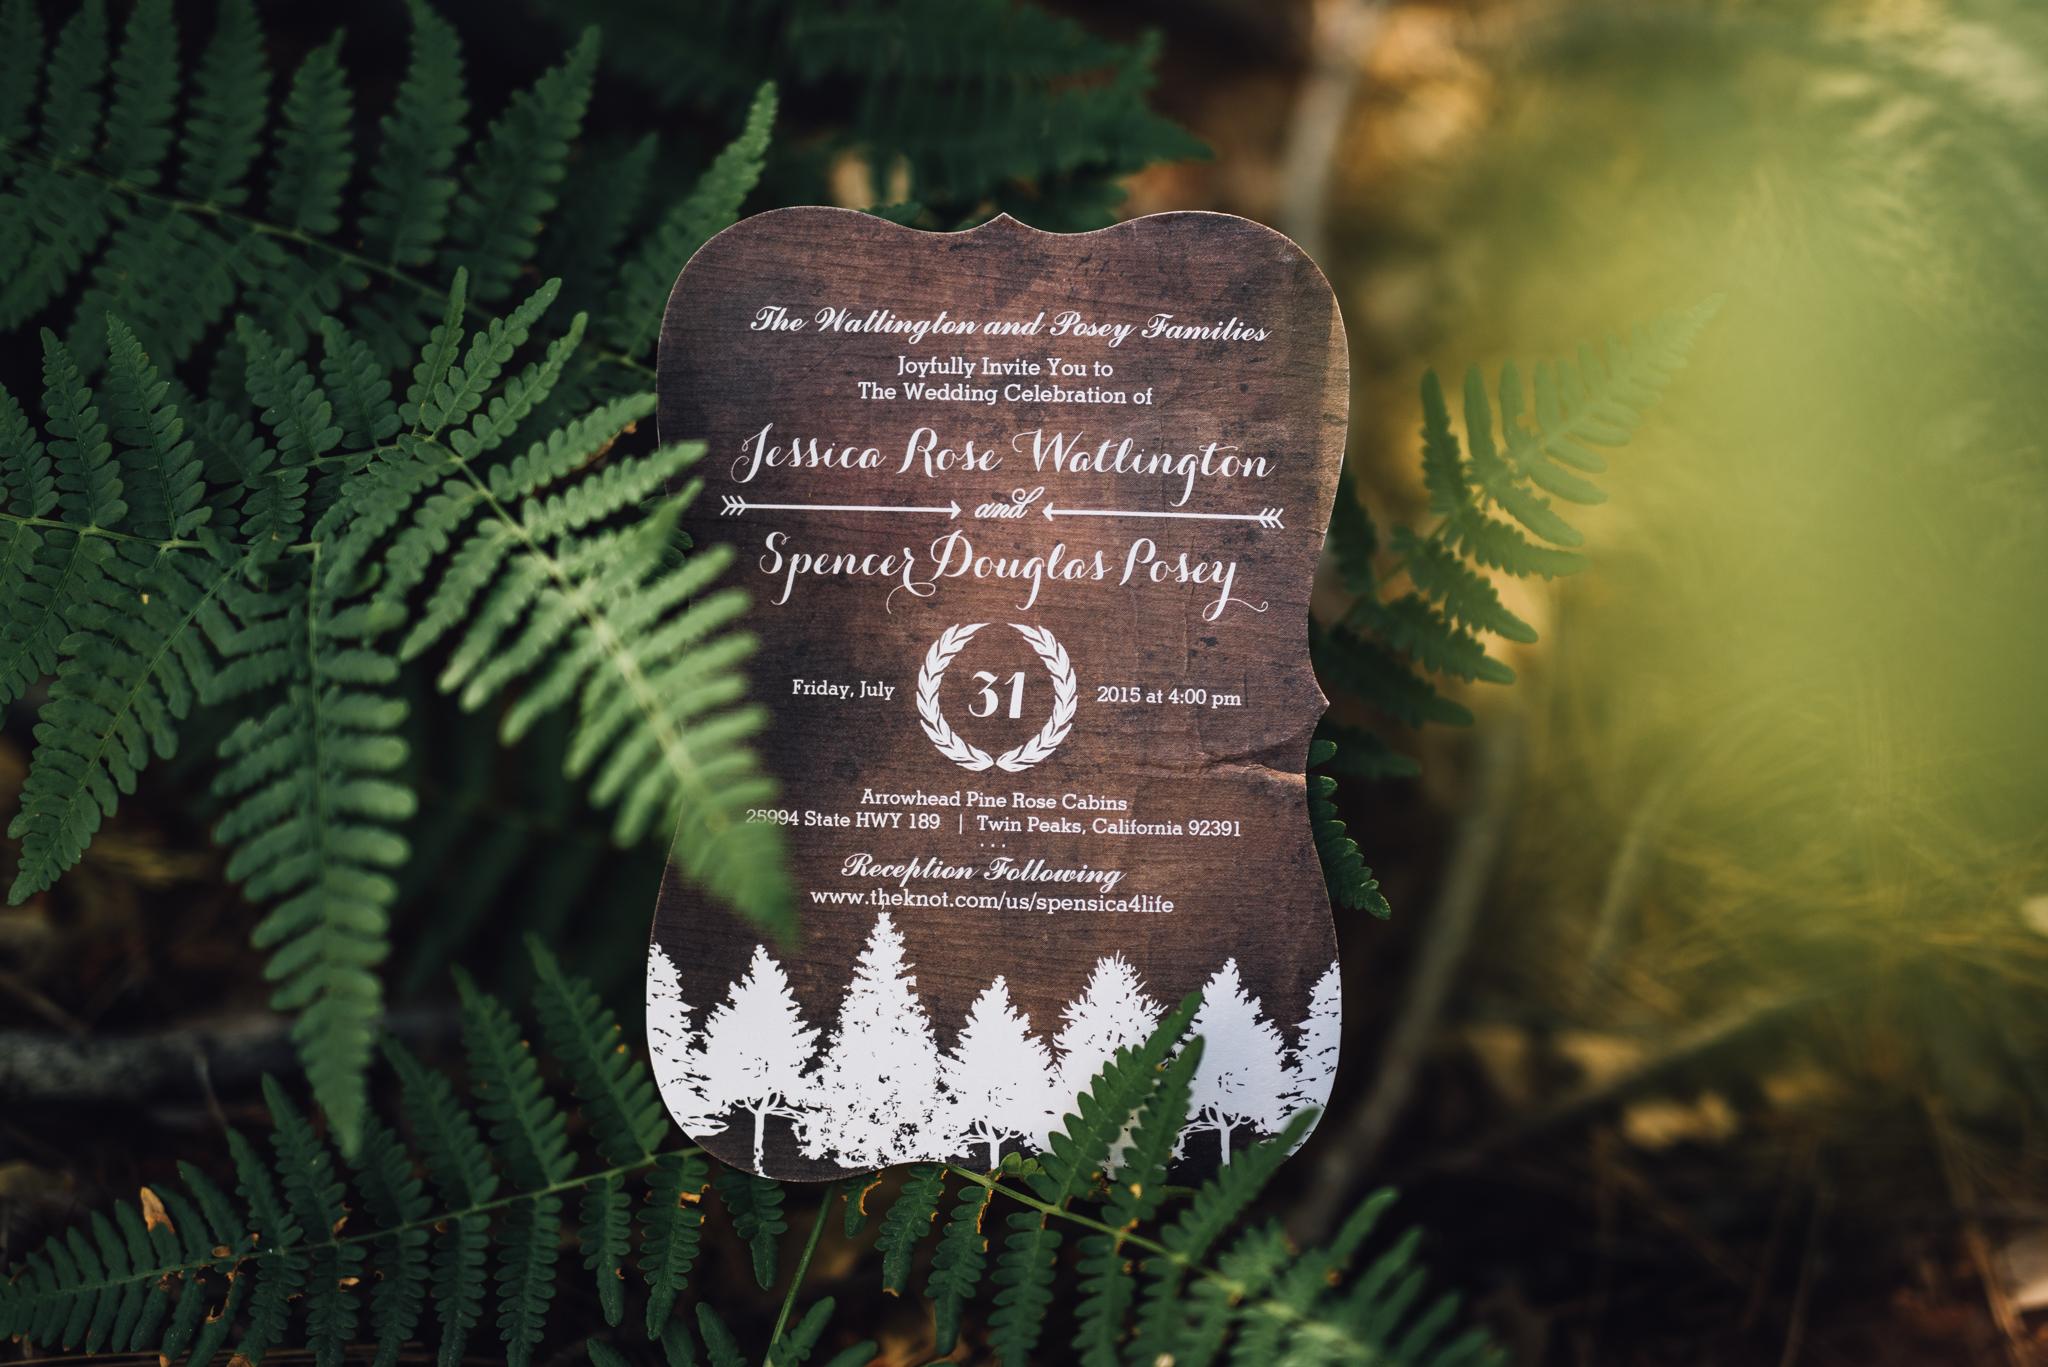 ©Isaiah & Taylor Photography - Pine Rose Cabin - Lake Arrowhead - Los Angeles Wedding Photographer-002.jpg